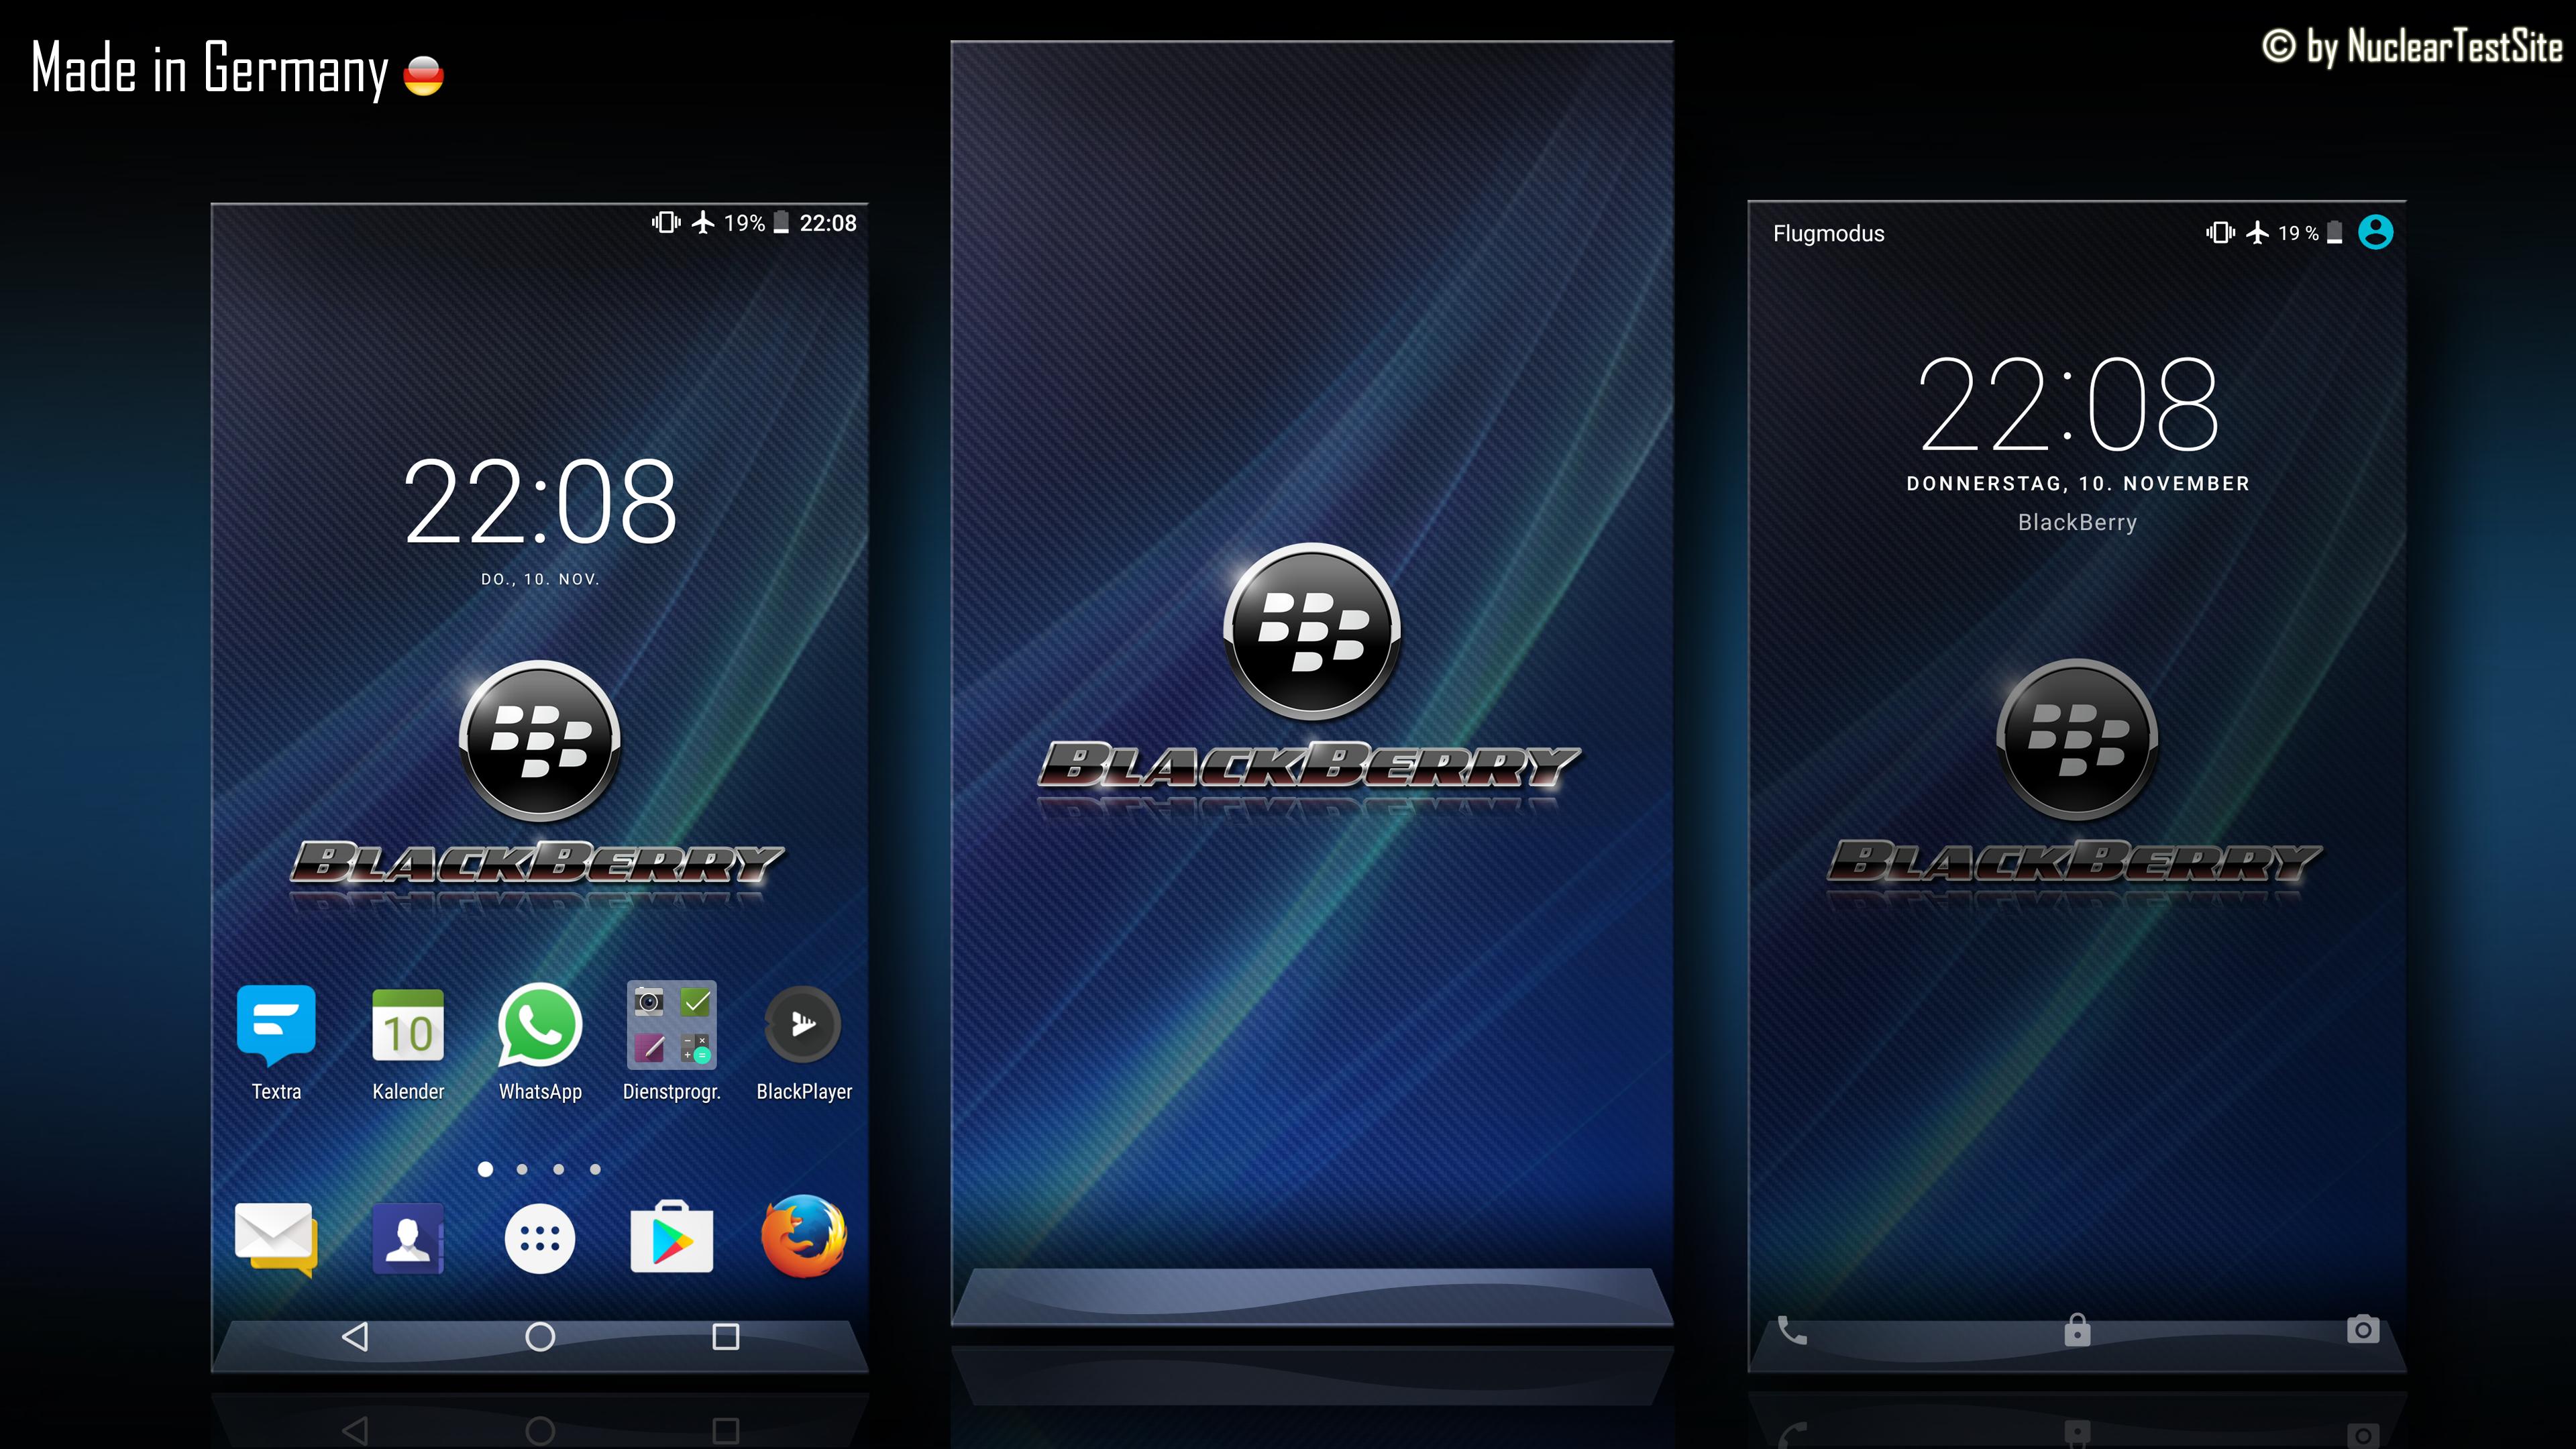 BlackBerry DTEK50 Wallpaper Pack By NuclearTestSite